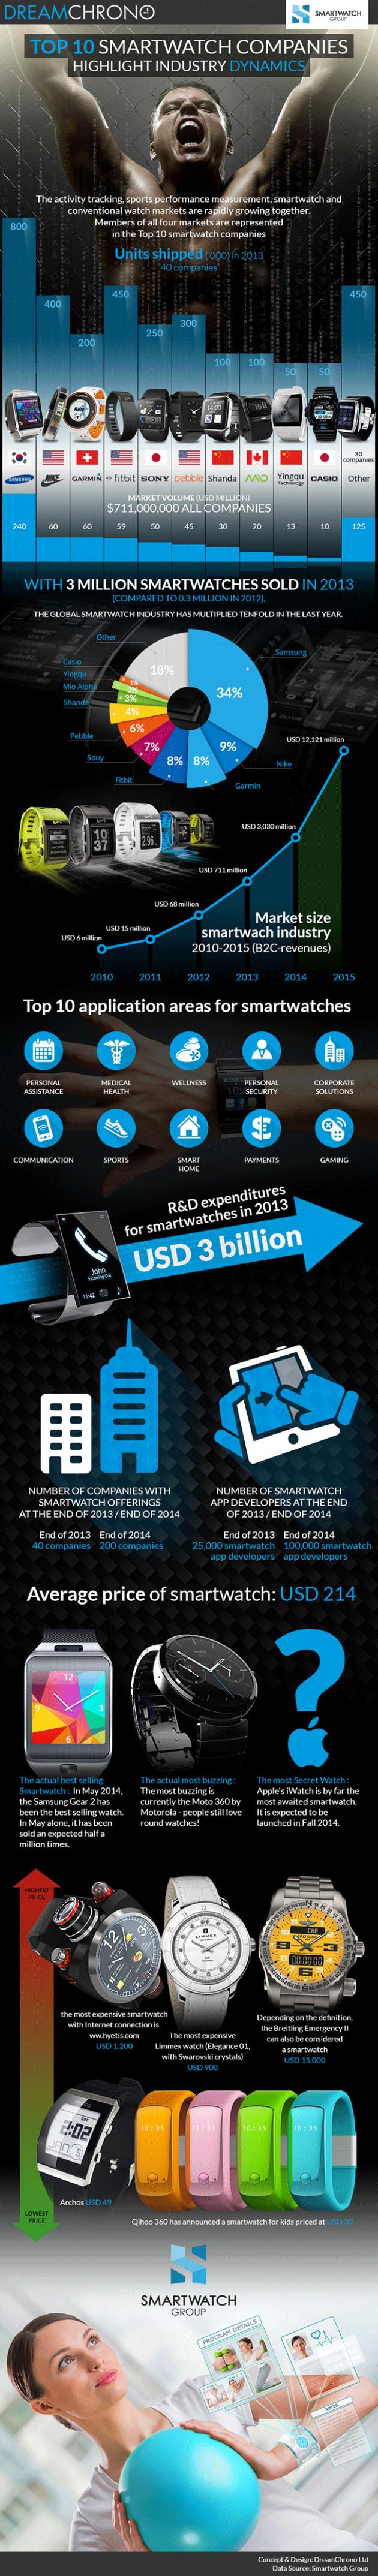 smartwatches-market-infographic